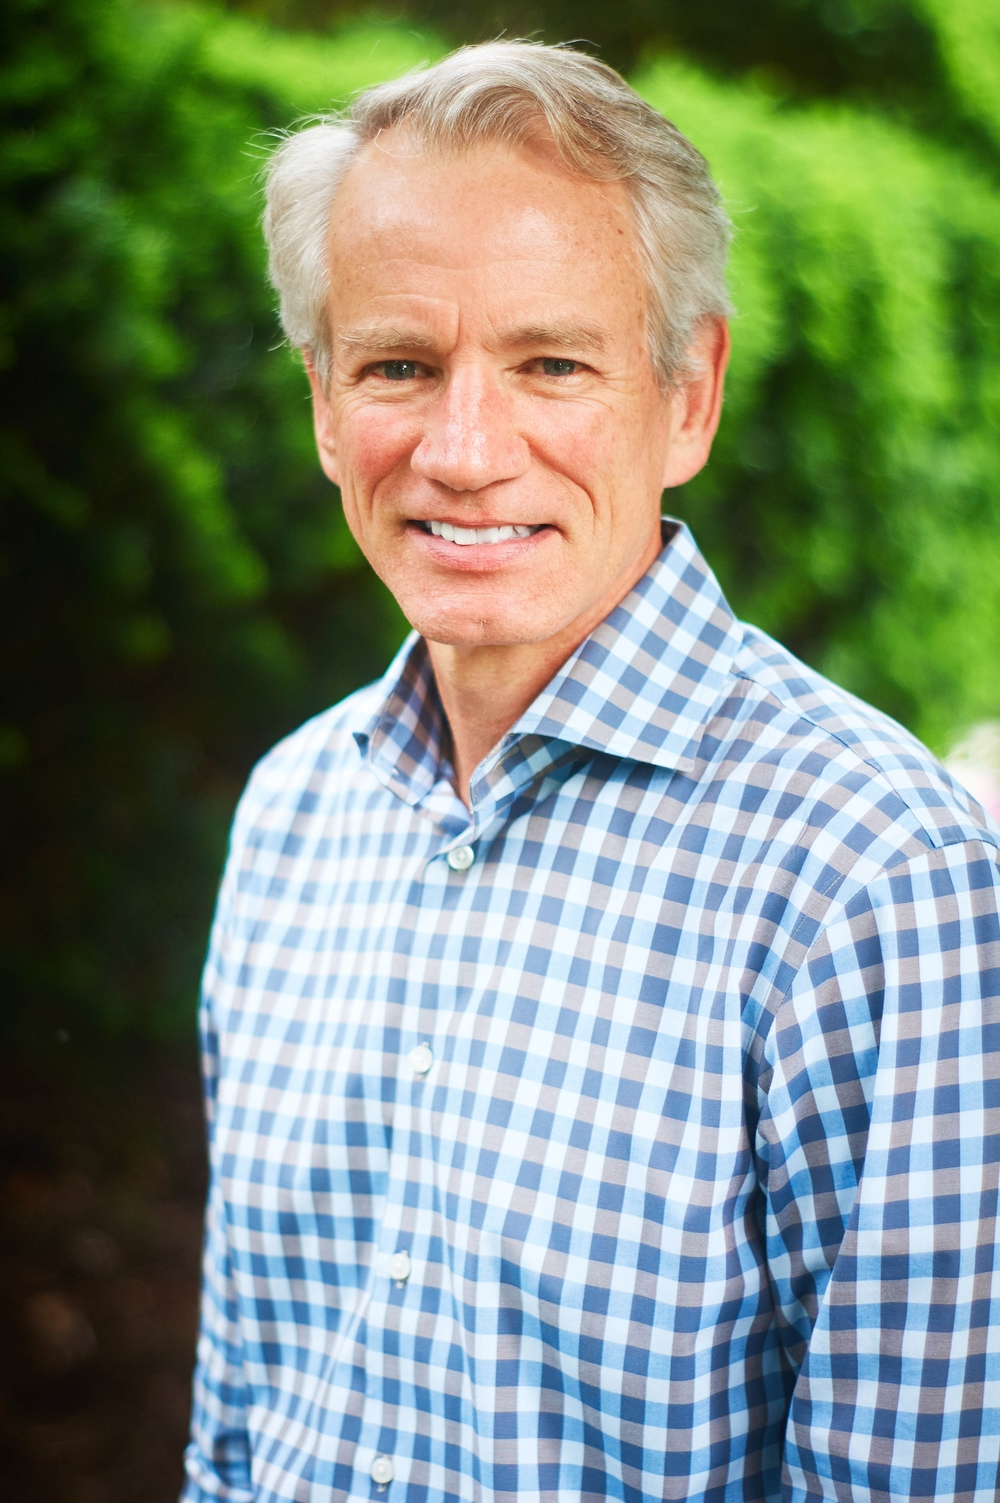 Bob Murphy, P.E., PTOE, RLS